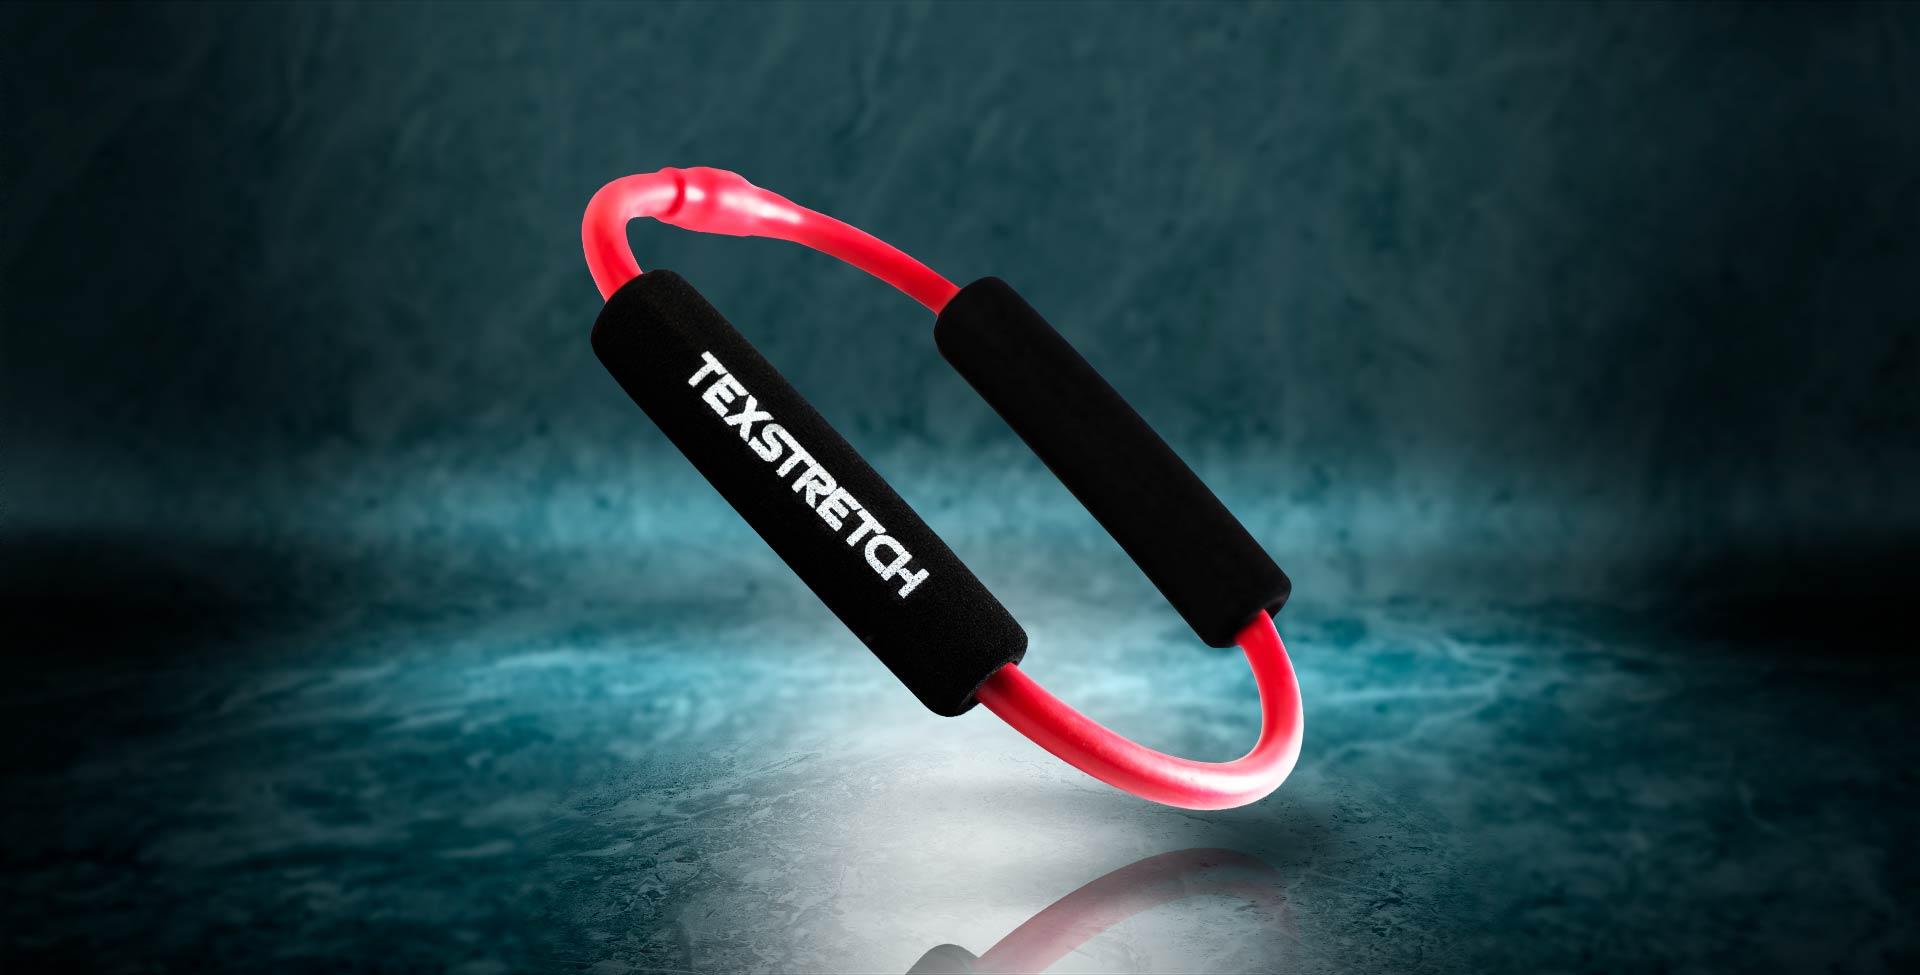 Texstretch O-Ring